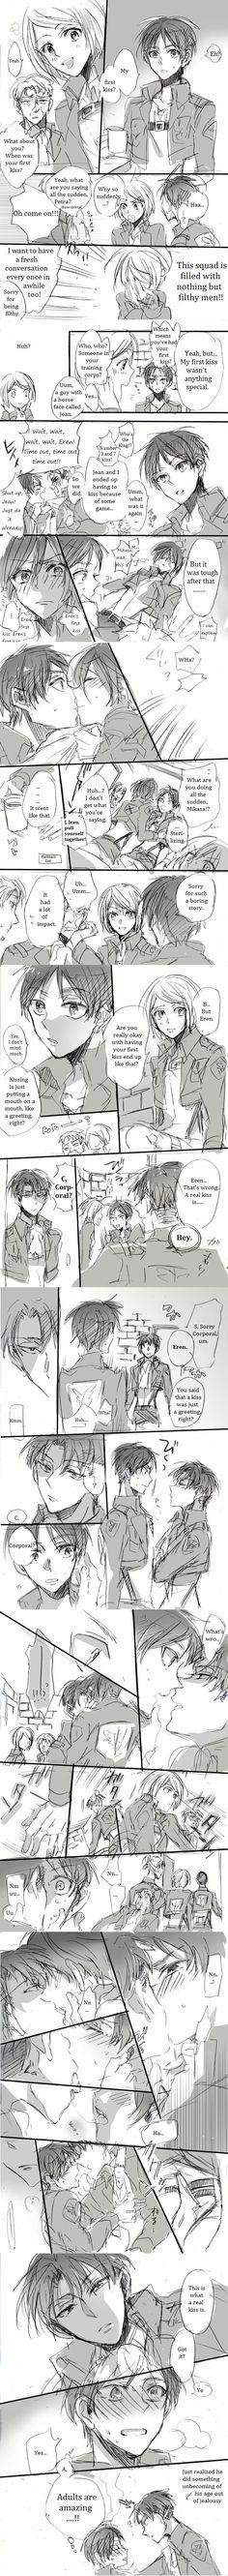 Shingeki no Kyojin - LeviRen - 15歳のファーストキスに嫉妬する三十路  A 30 Year Old Jealous of a 15 Year Old's First Kiss  Artist: 北沢ハルカ